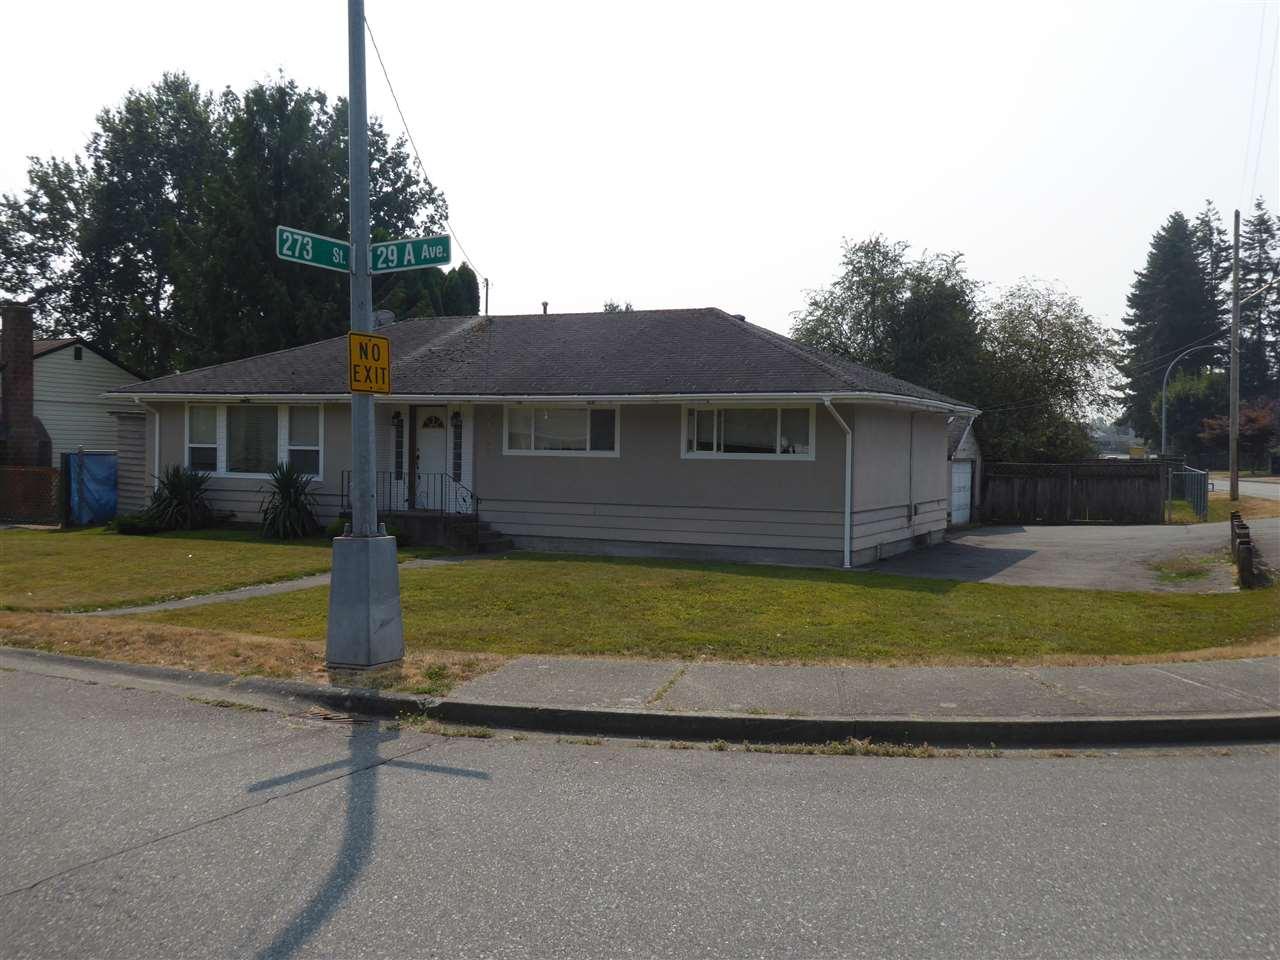 27340 29A AVENUE, Langley